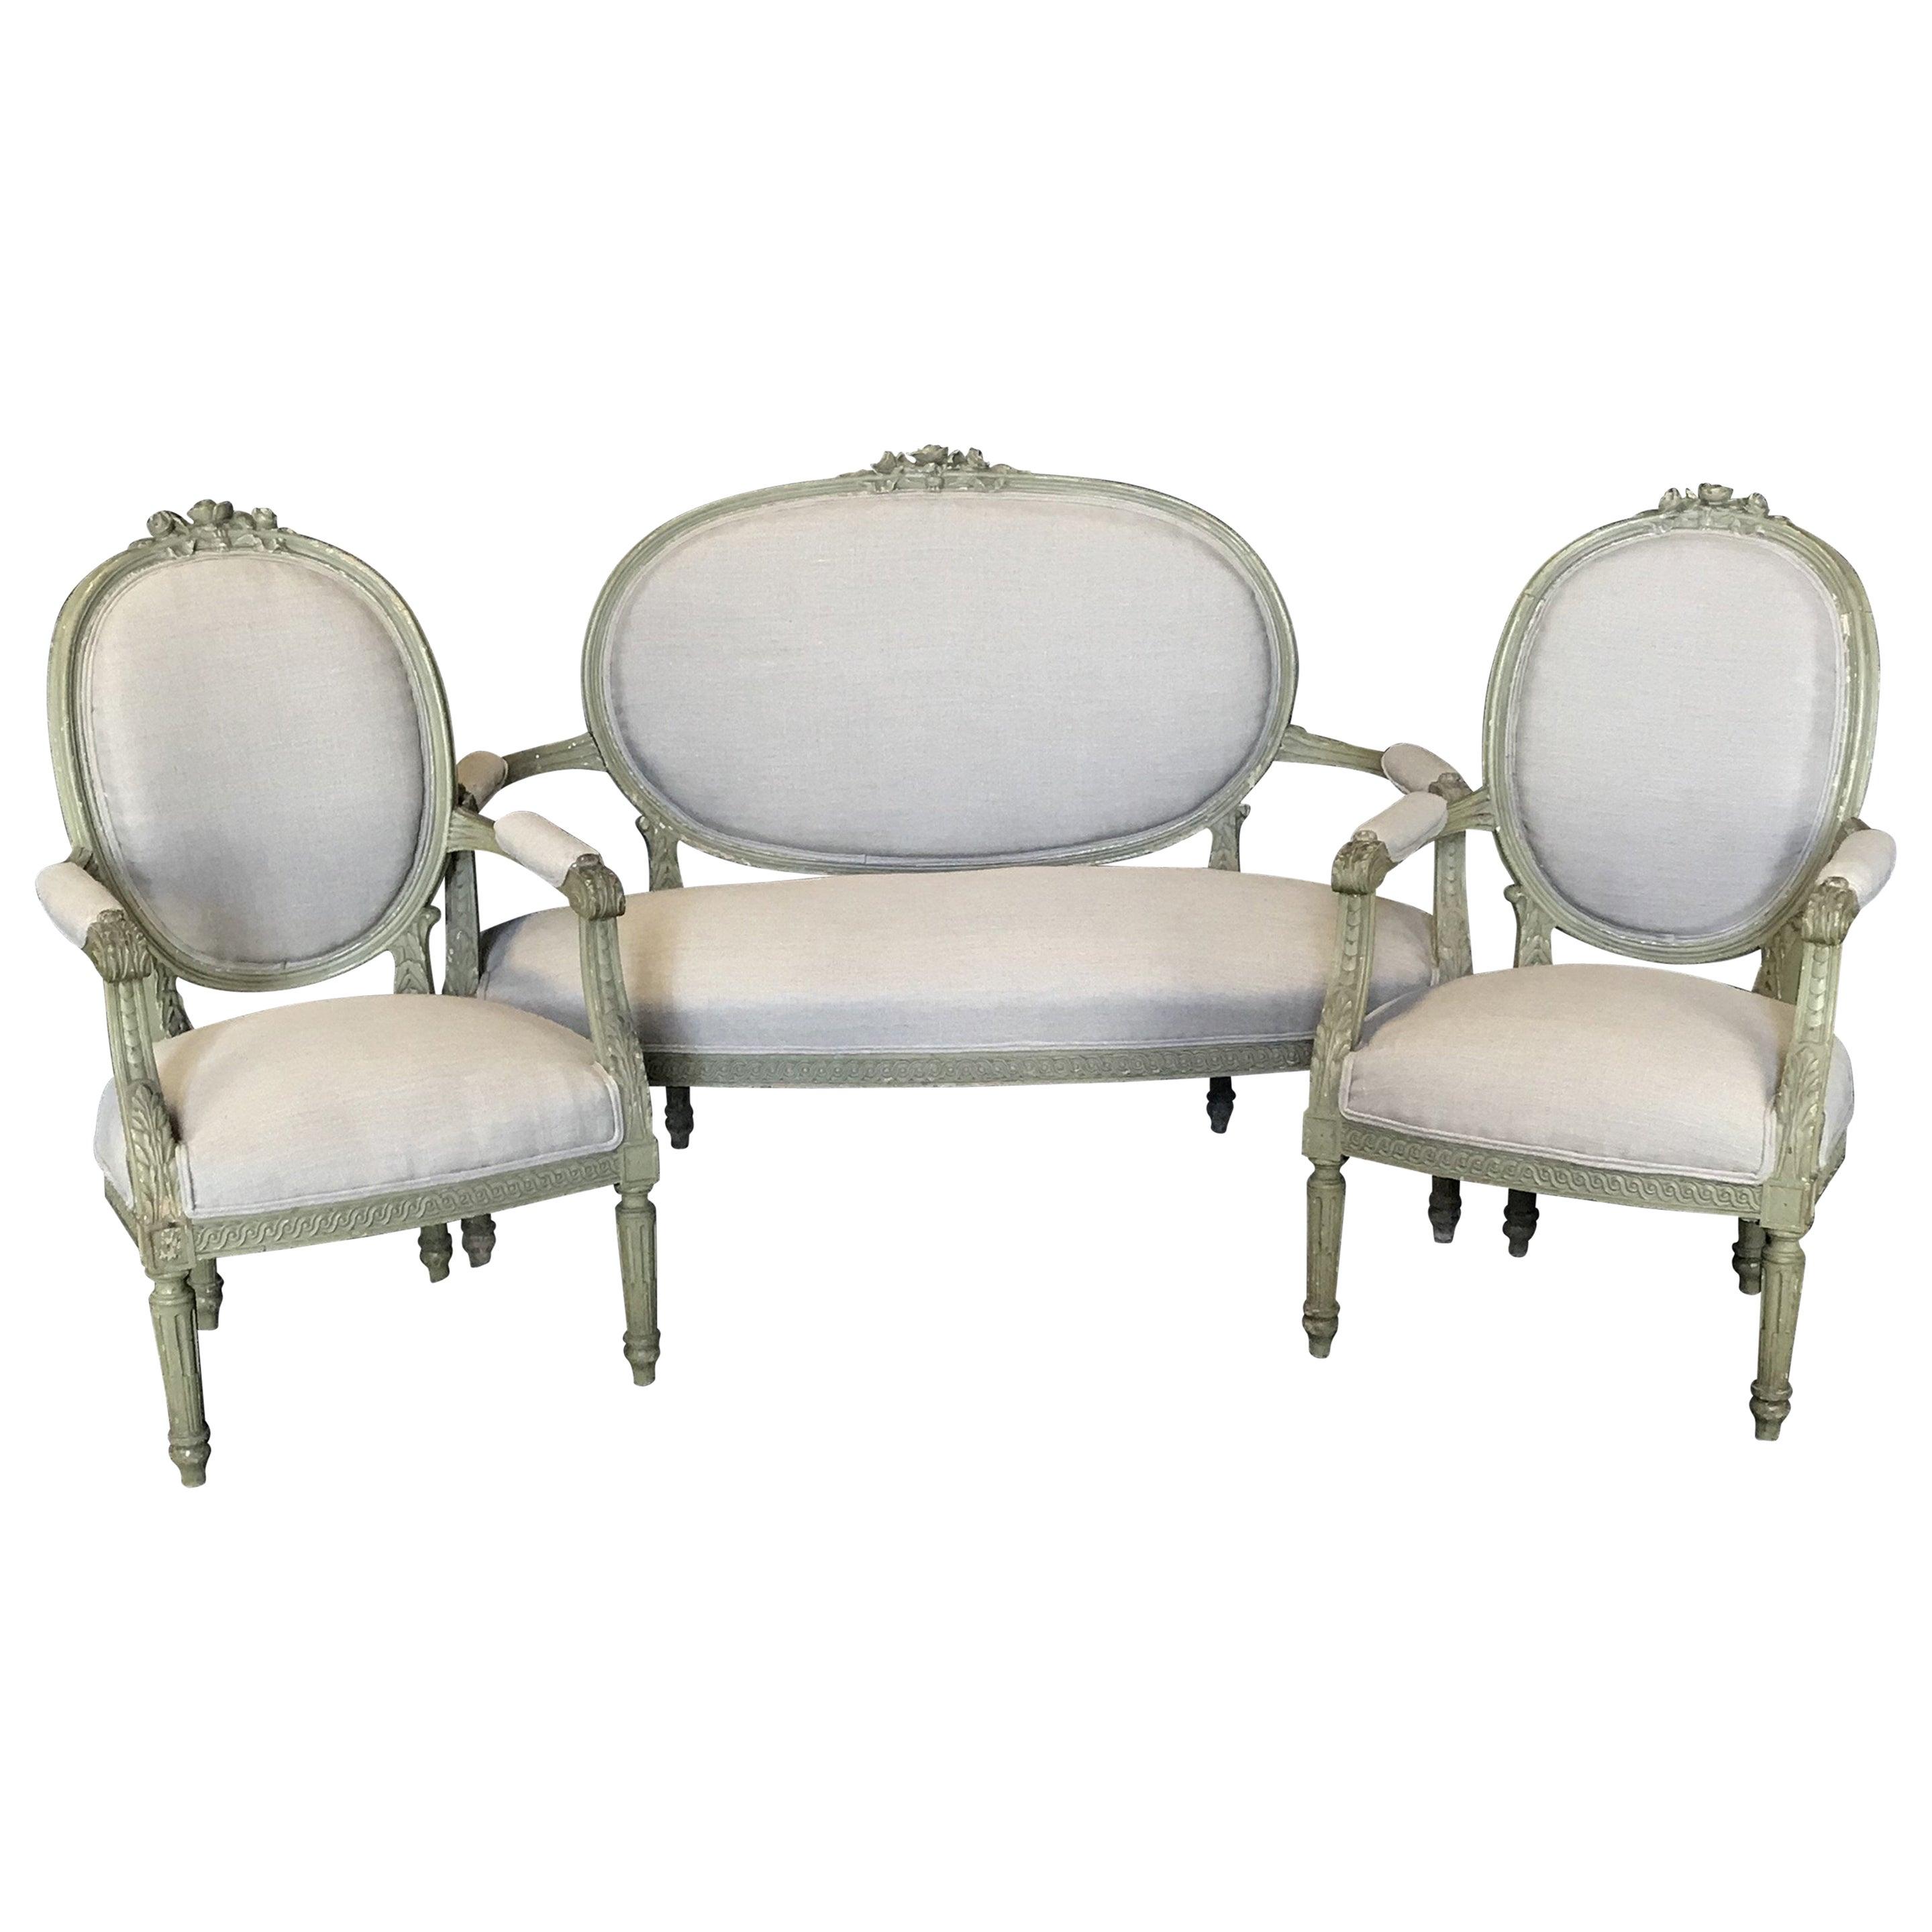 Lovely French Louis XVI Belle Epoque Parlor or Salon Set